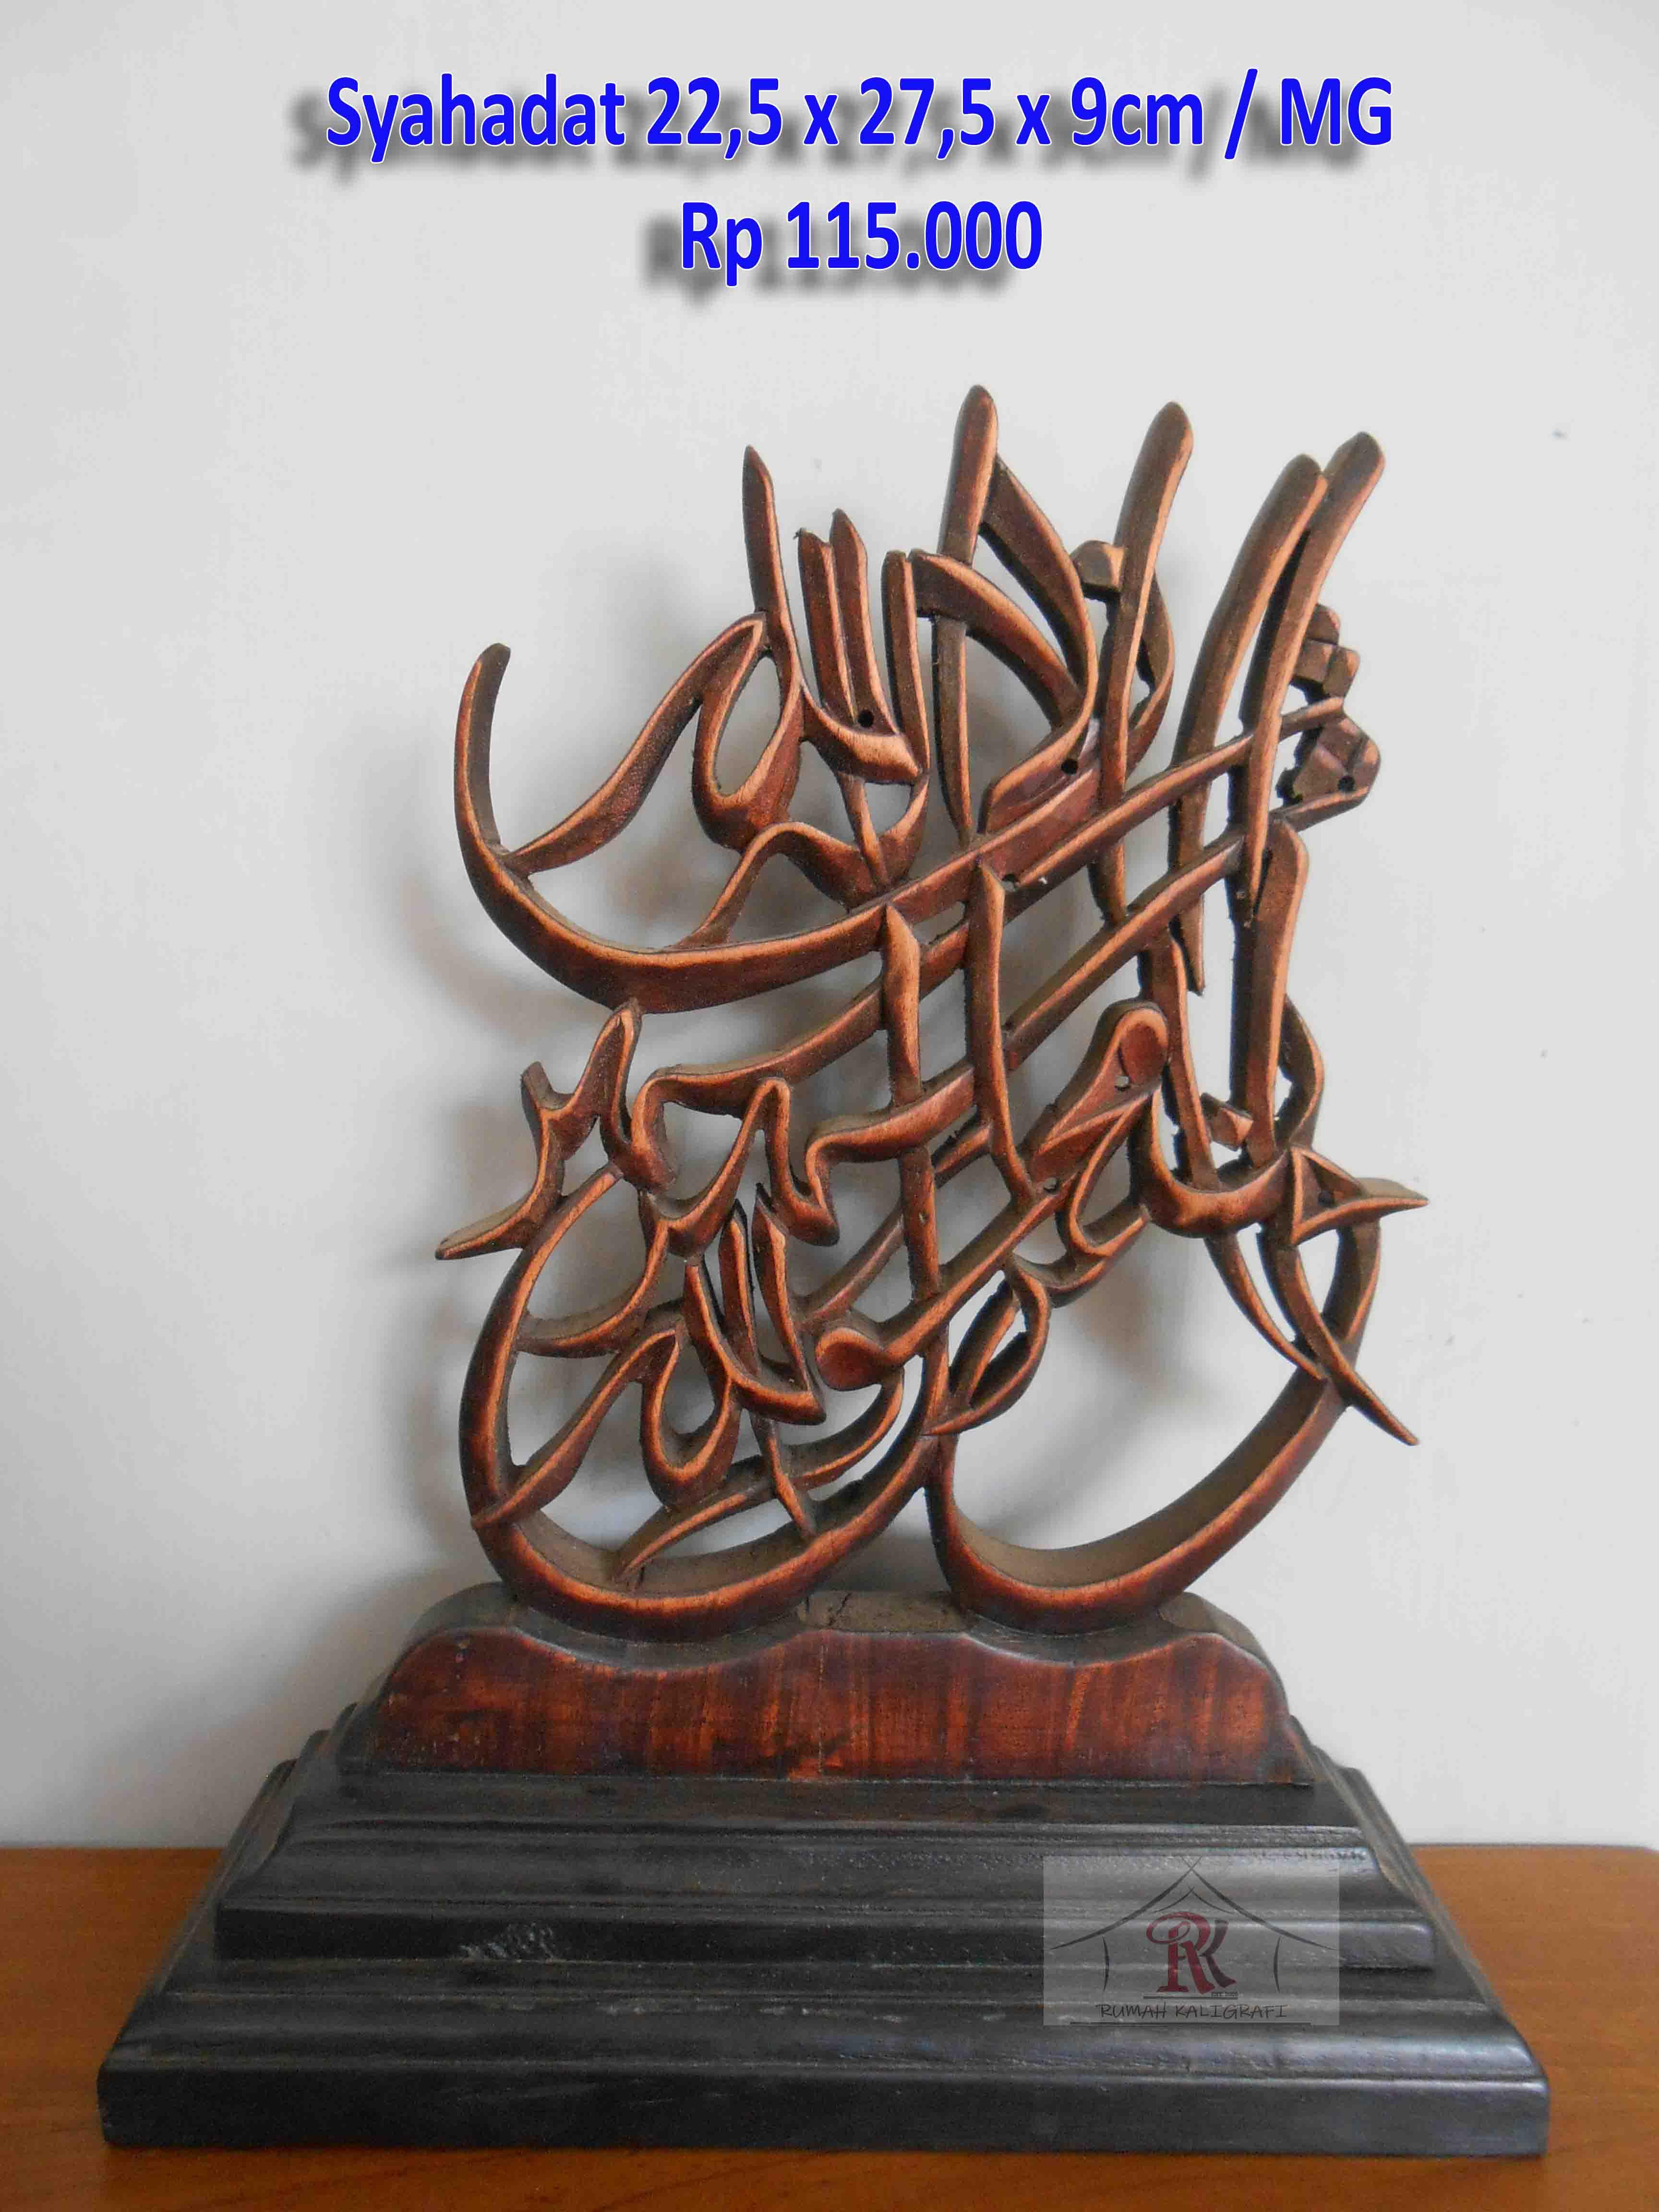 Kaligrafi Ukir, Syahadat Plangkat Model 2